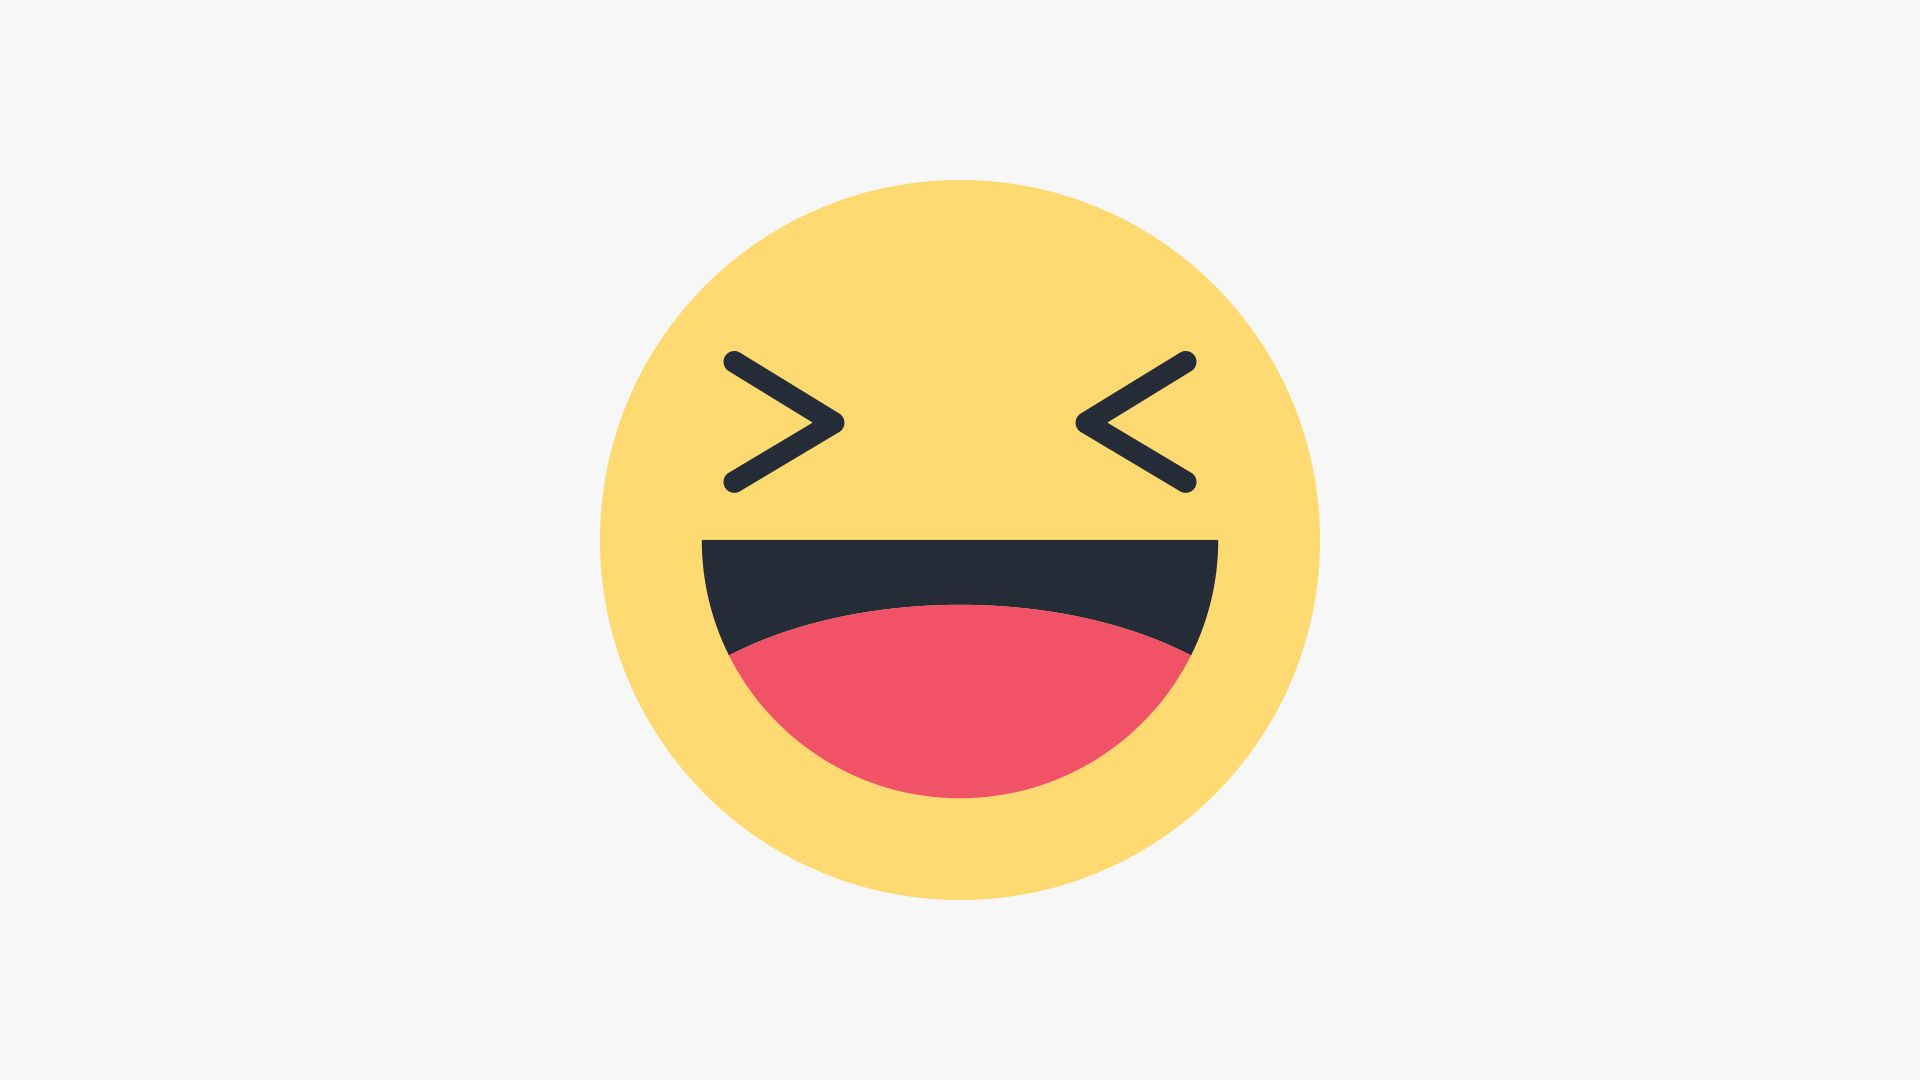 Draw Facebook Haha Emoji In Illustrator ร ปตลก